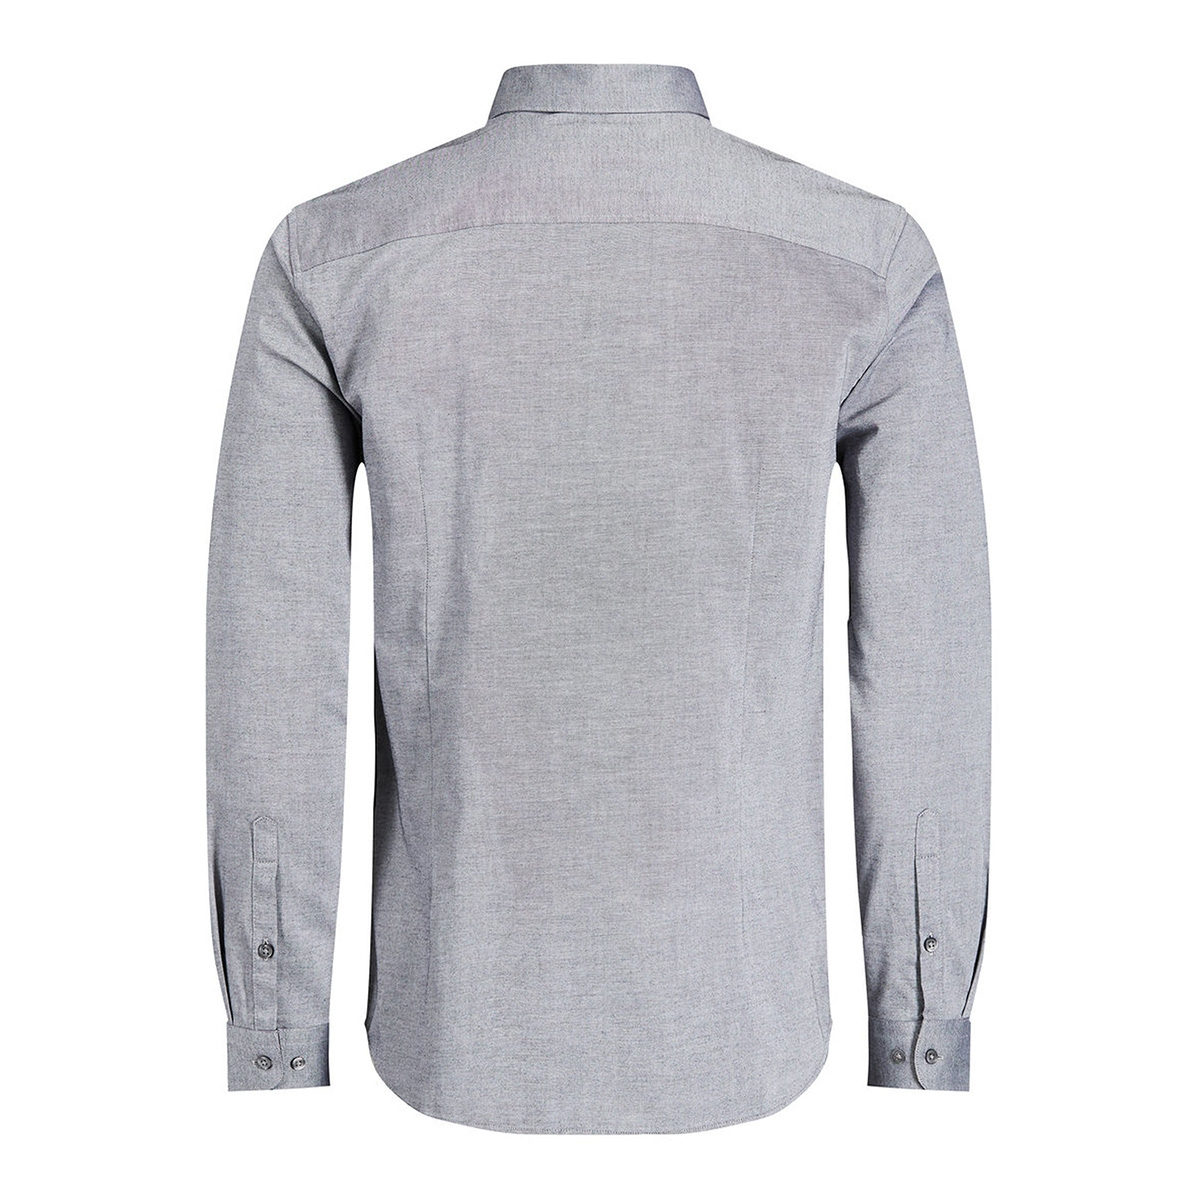 jprx-mas shirt l/s plain 12130351 jack & jones overhemd grey melange